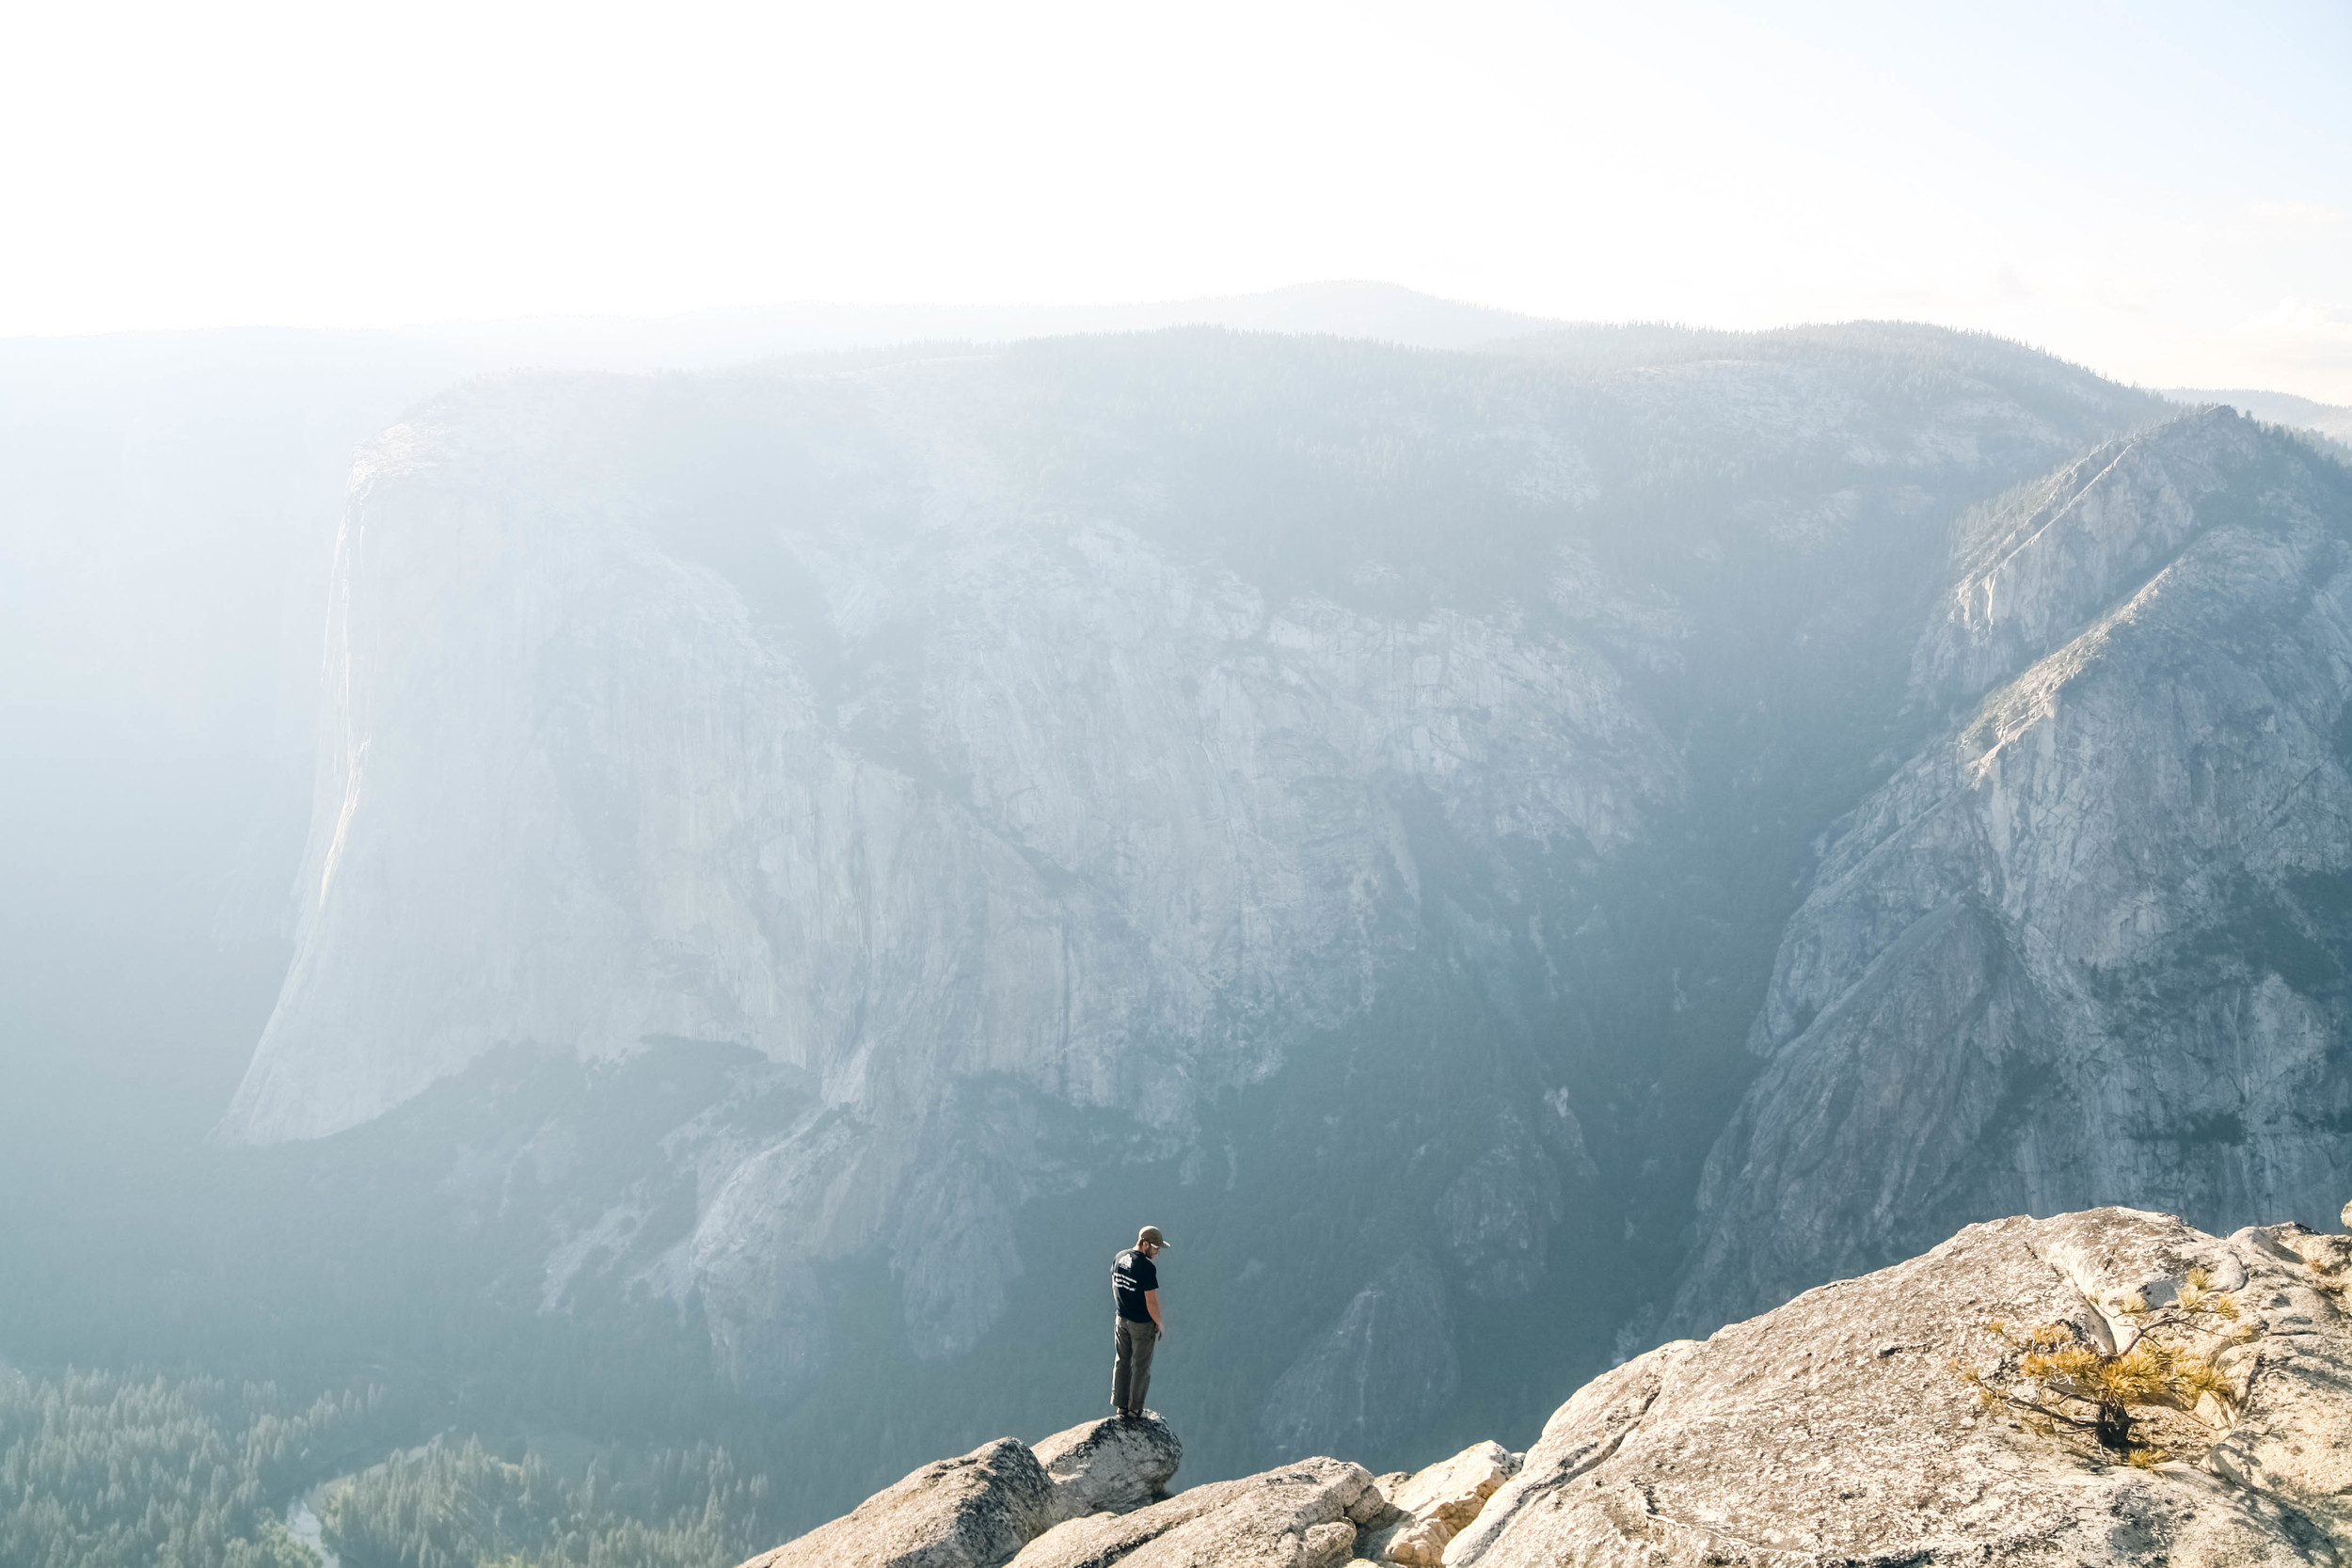 thisworldexists this world exists miranda leconte adventure travel outdoor yosemite view